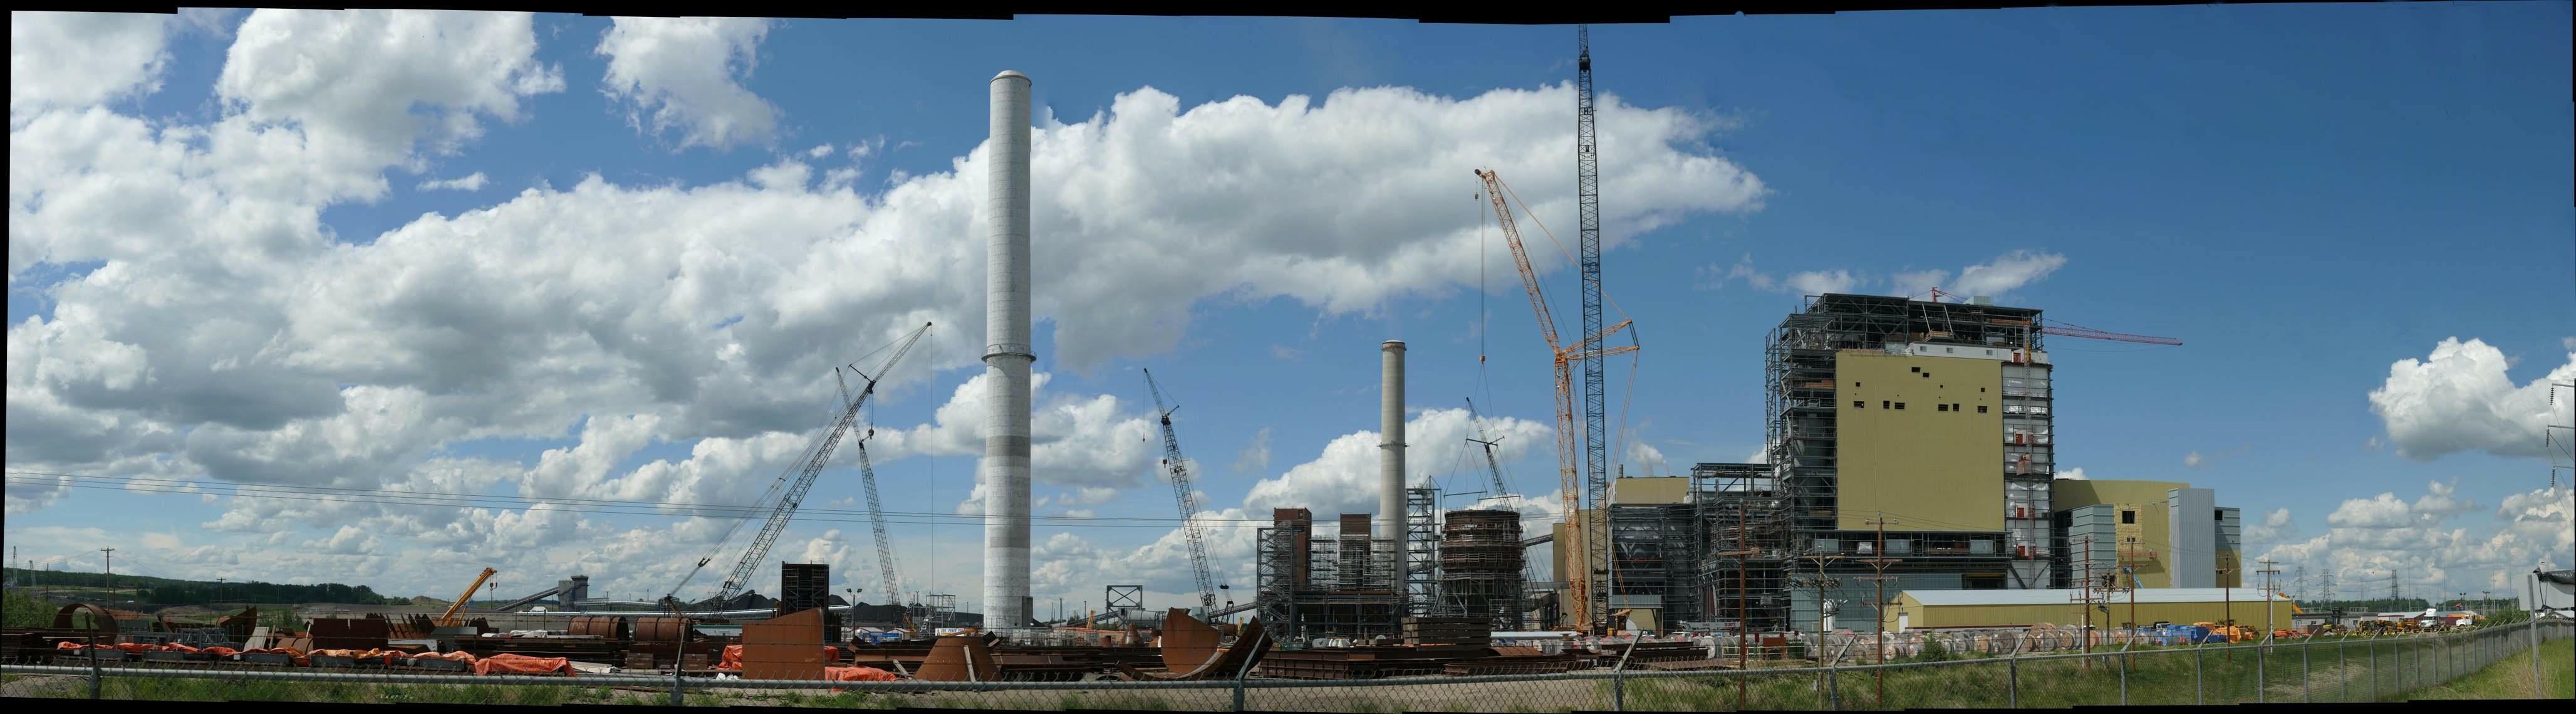 Keephills power plant under construction